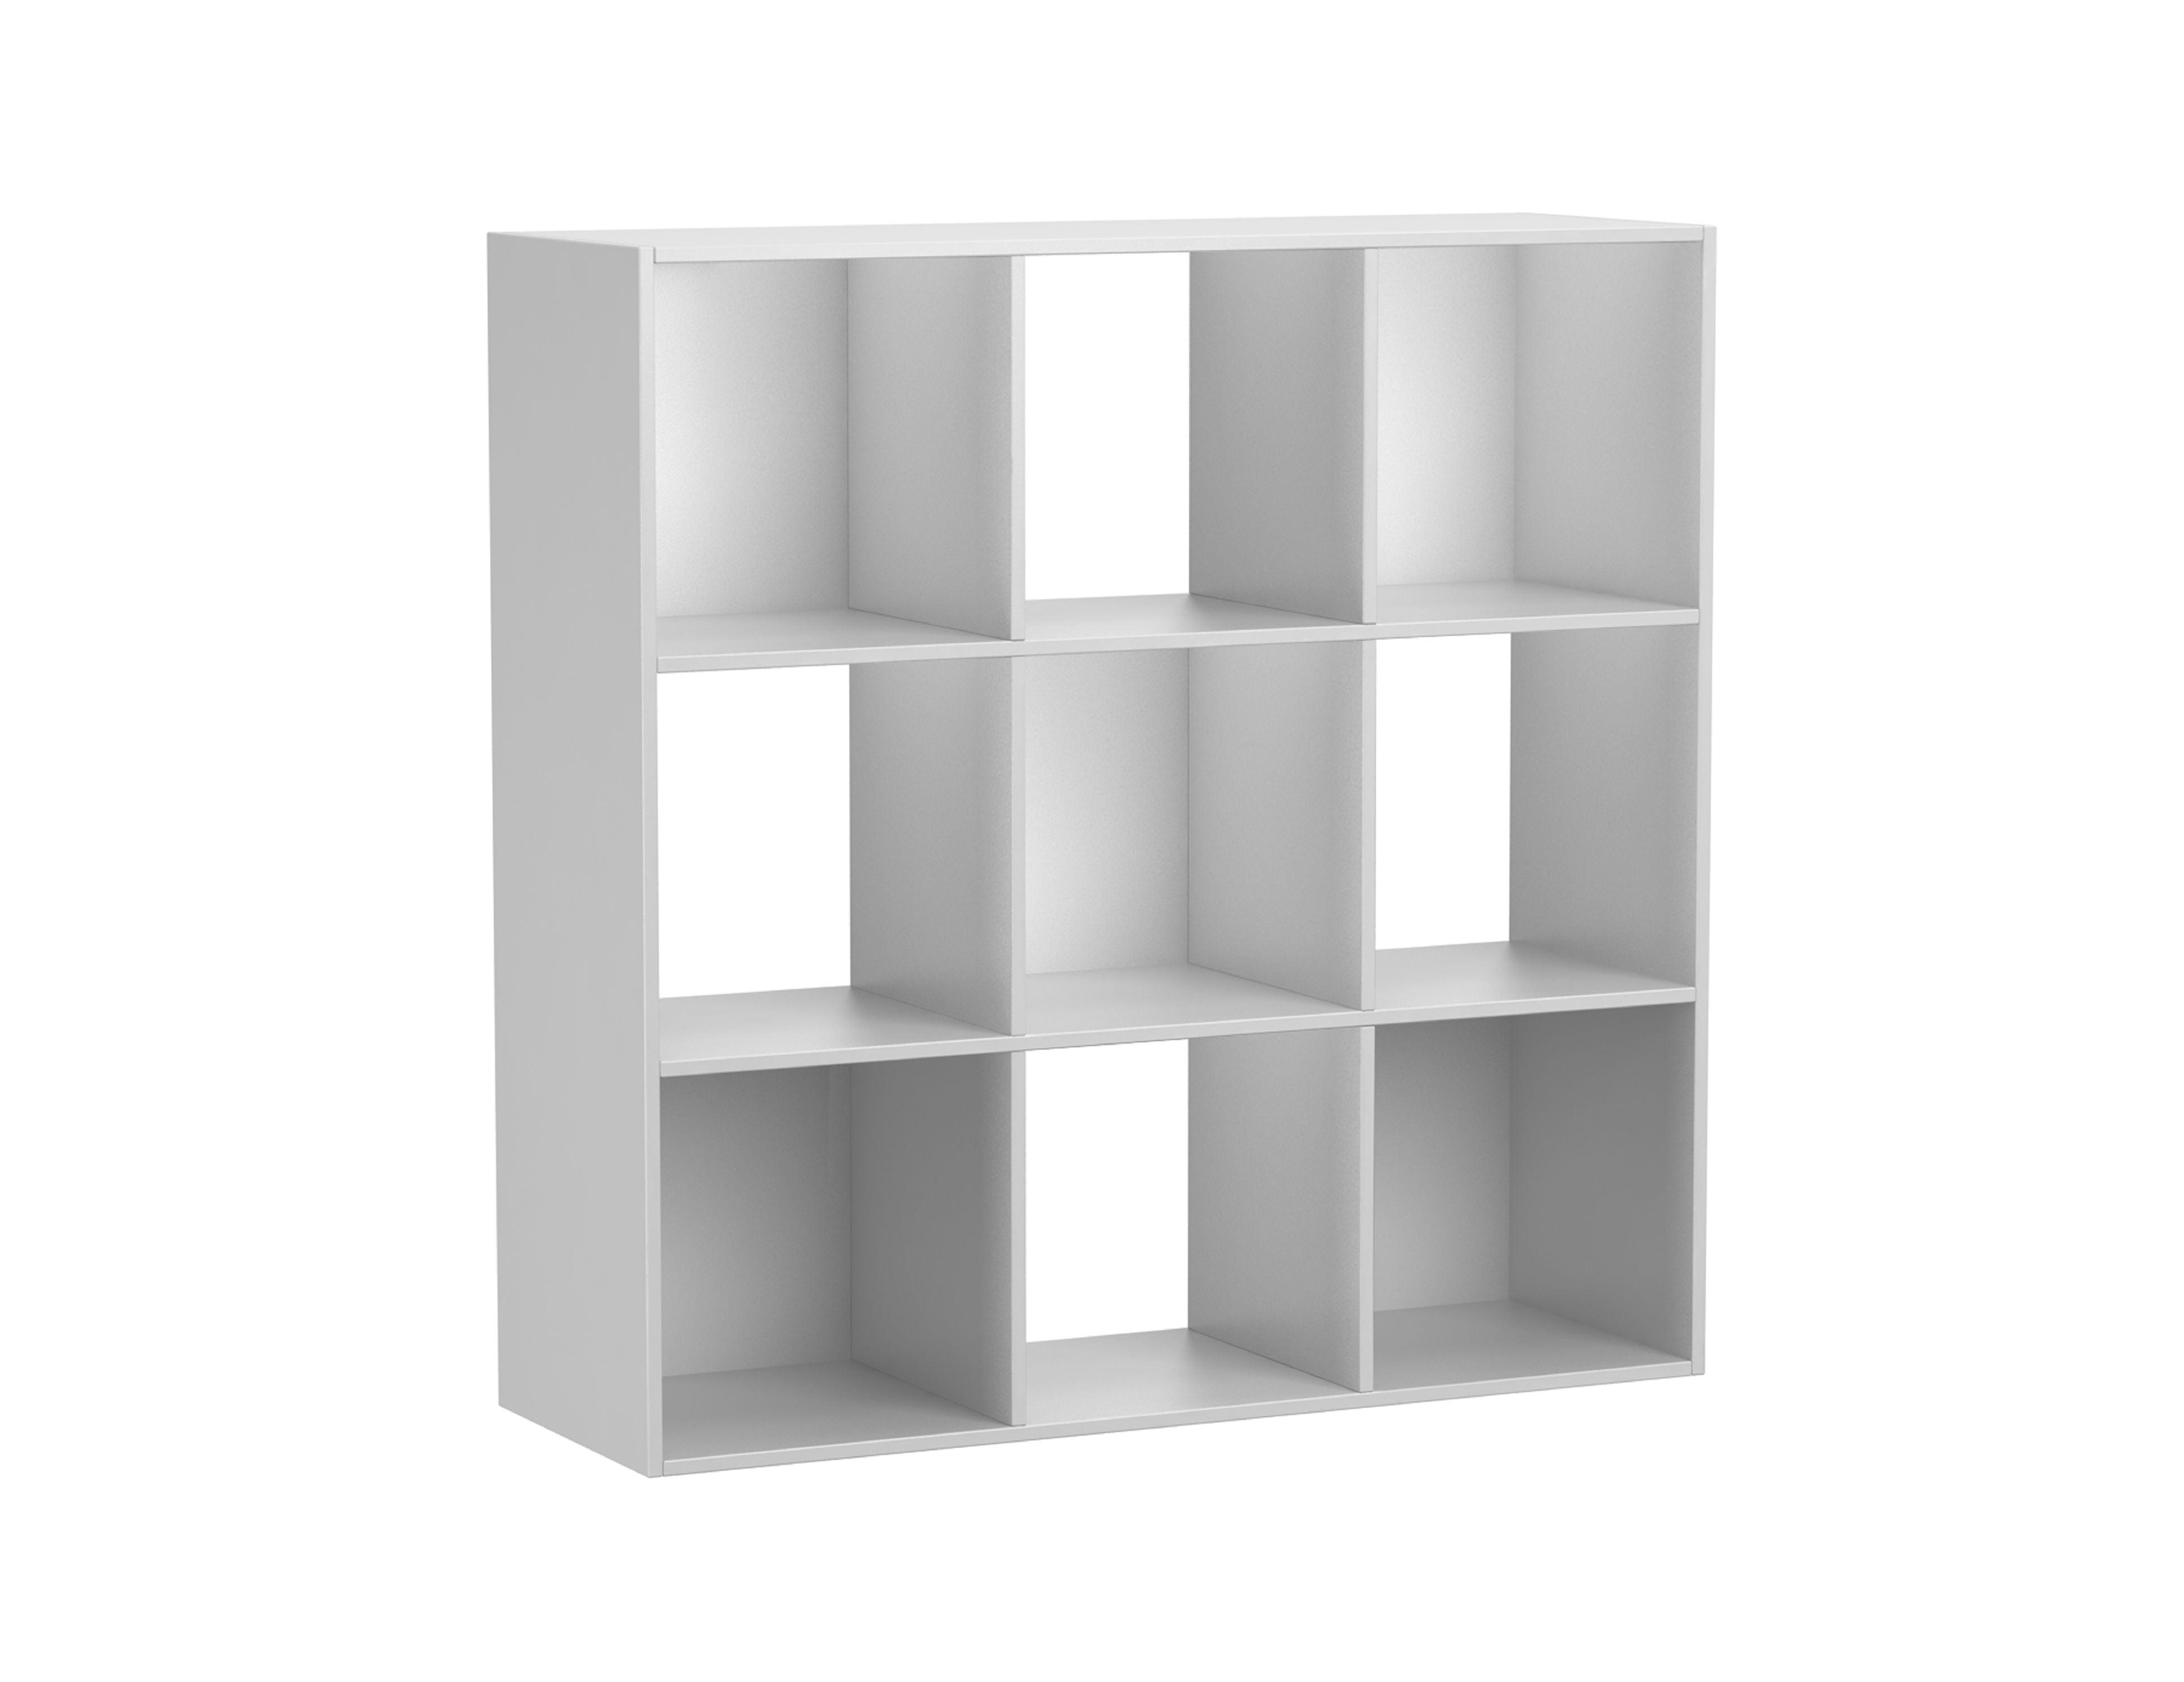 Mainstays 9 Cube Storage Organizer, Multiple Colors